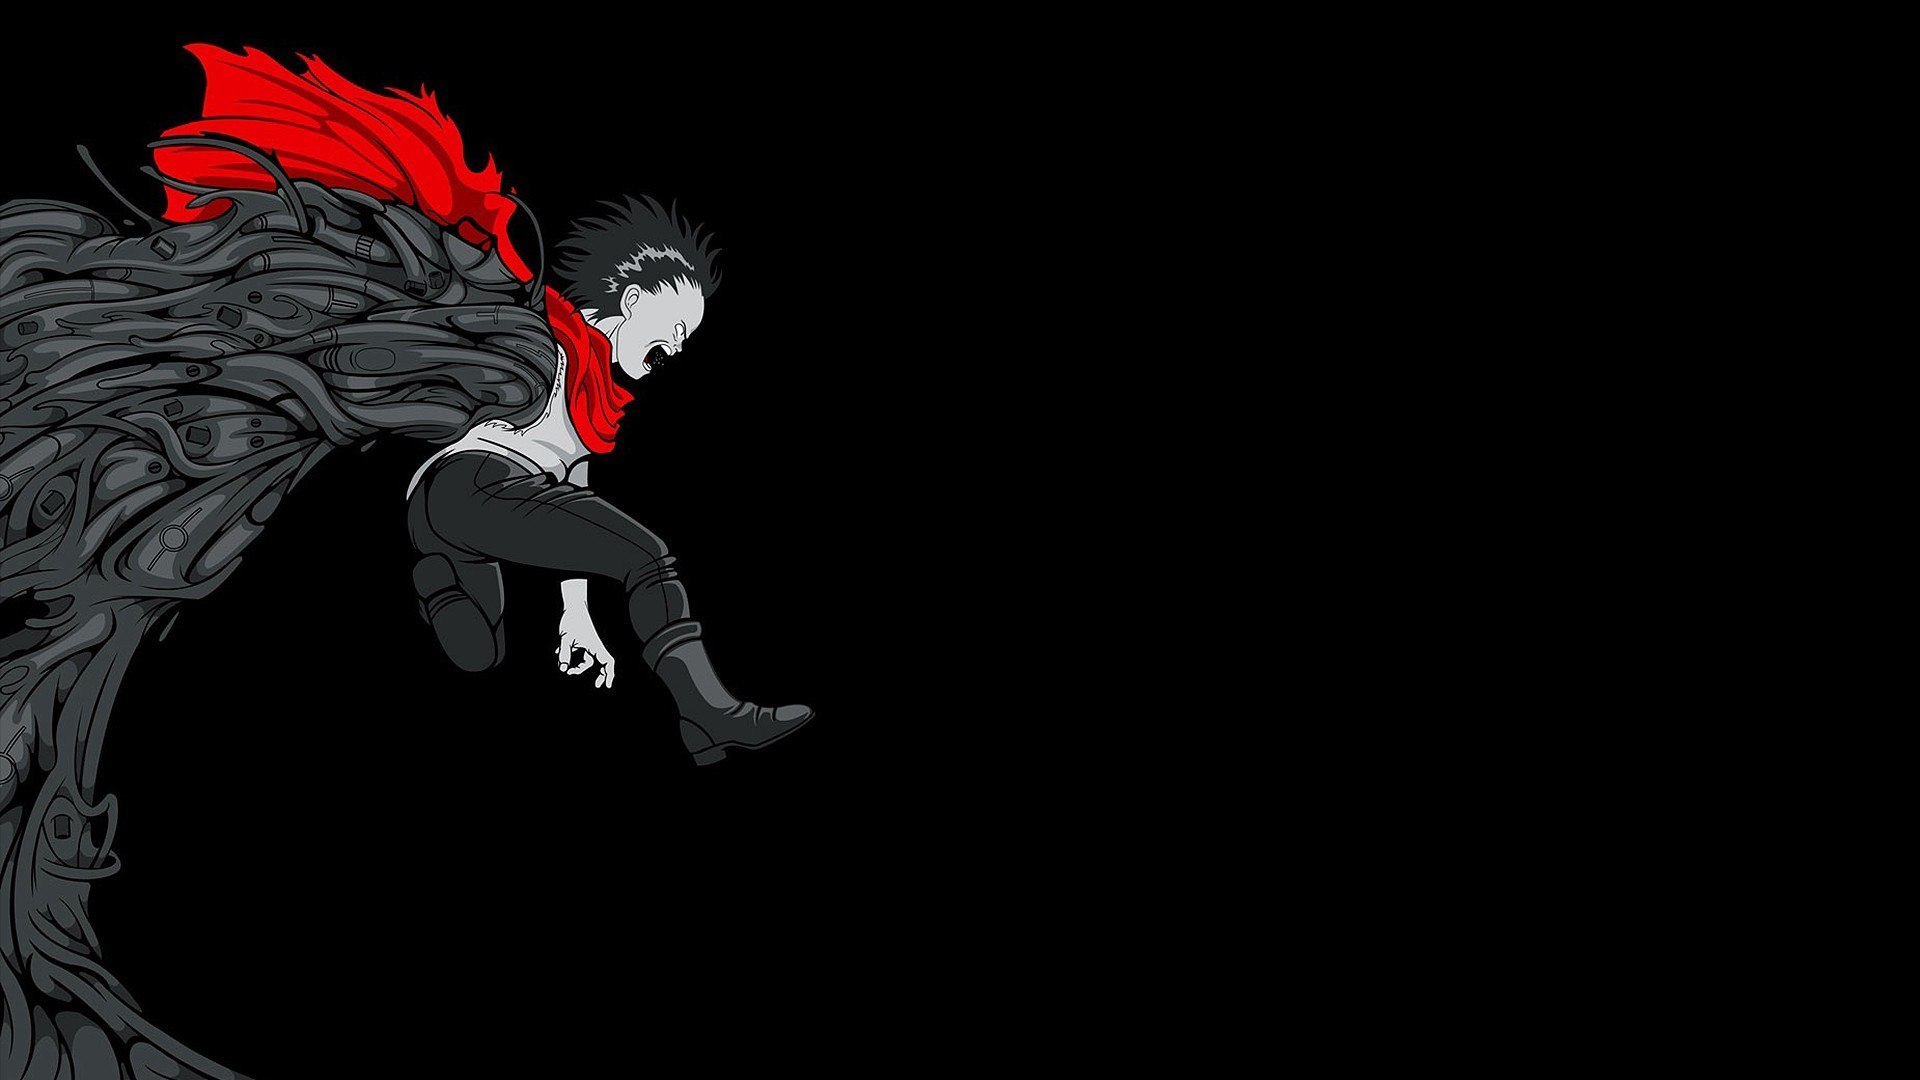 Akira wallpaper download free hd wallpapers for desktop - Anime wallpaper black background ...